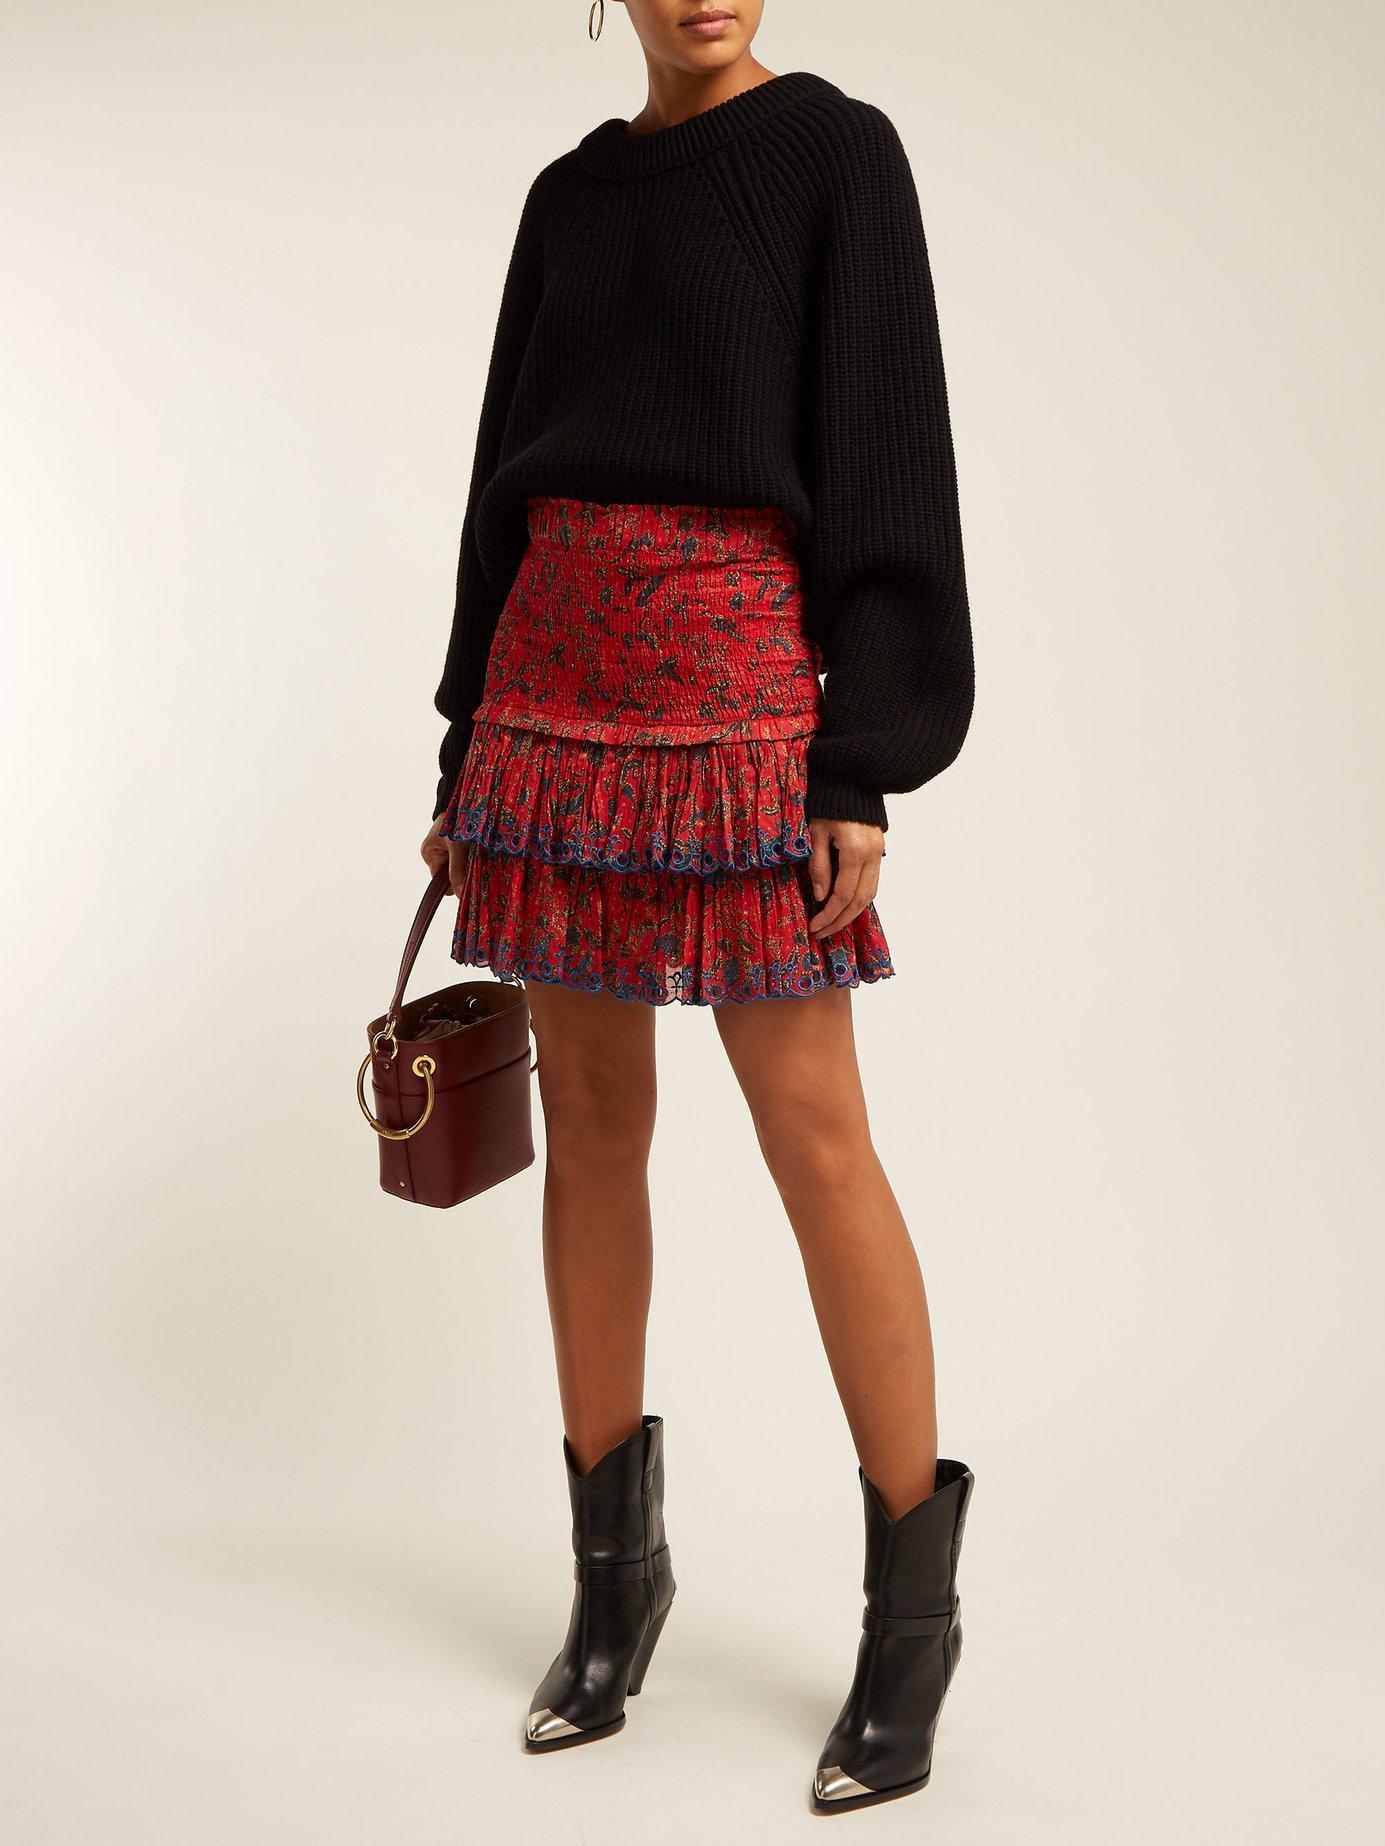 5def0ef78cff1 Étoile Isabel Marant Naomi Floral Print Mini Skirt in Red - Lyst